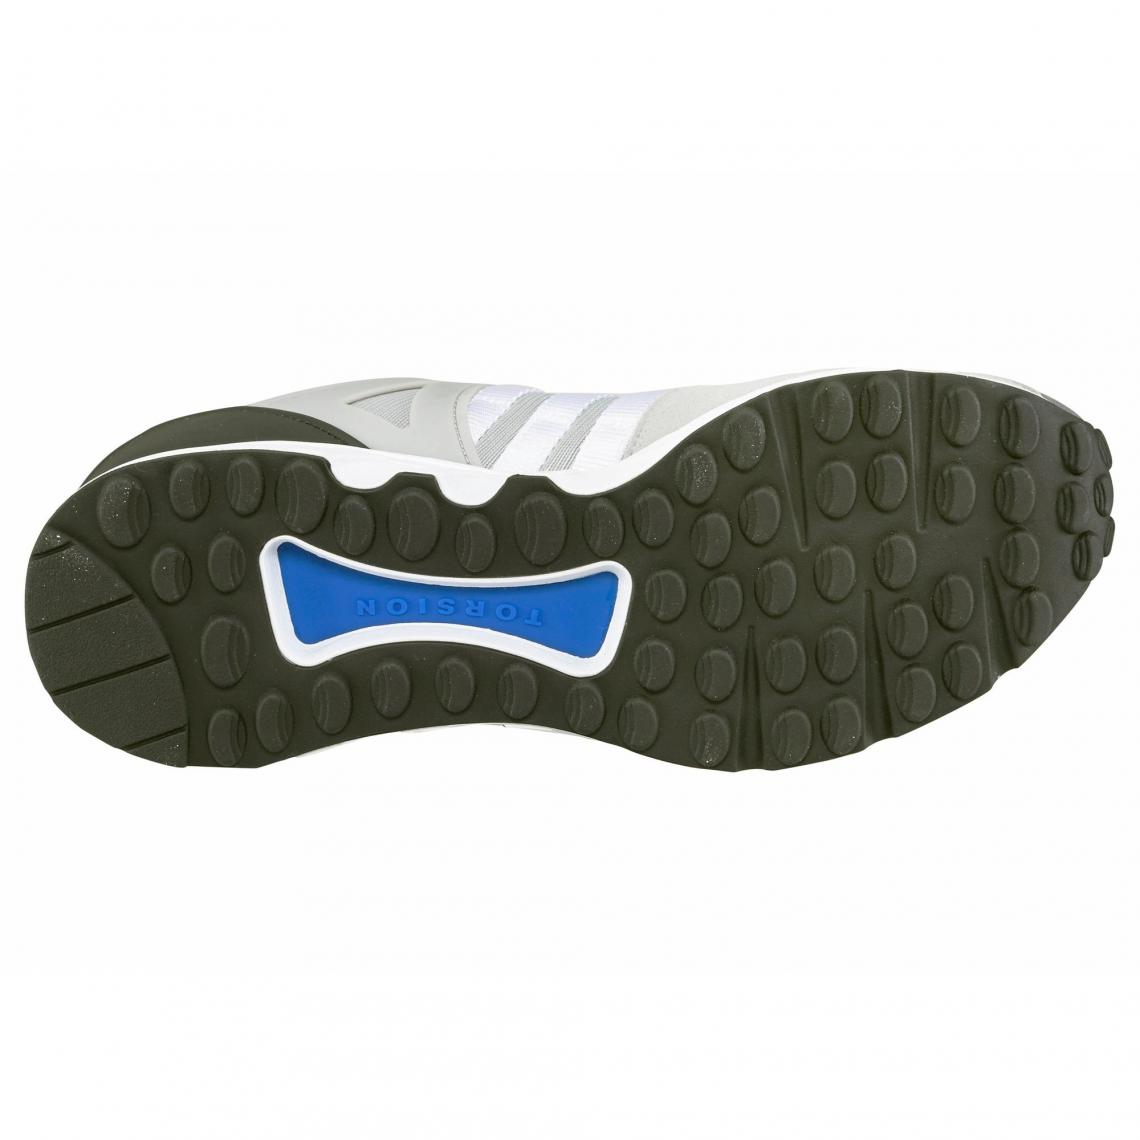 low priced 20570 5dcbe adidas Originals EQT Support RF chaussures de running homme - Blanc - Noir  Adidas Originals